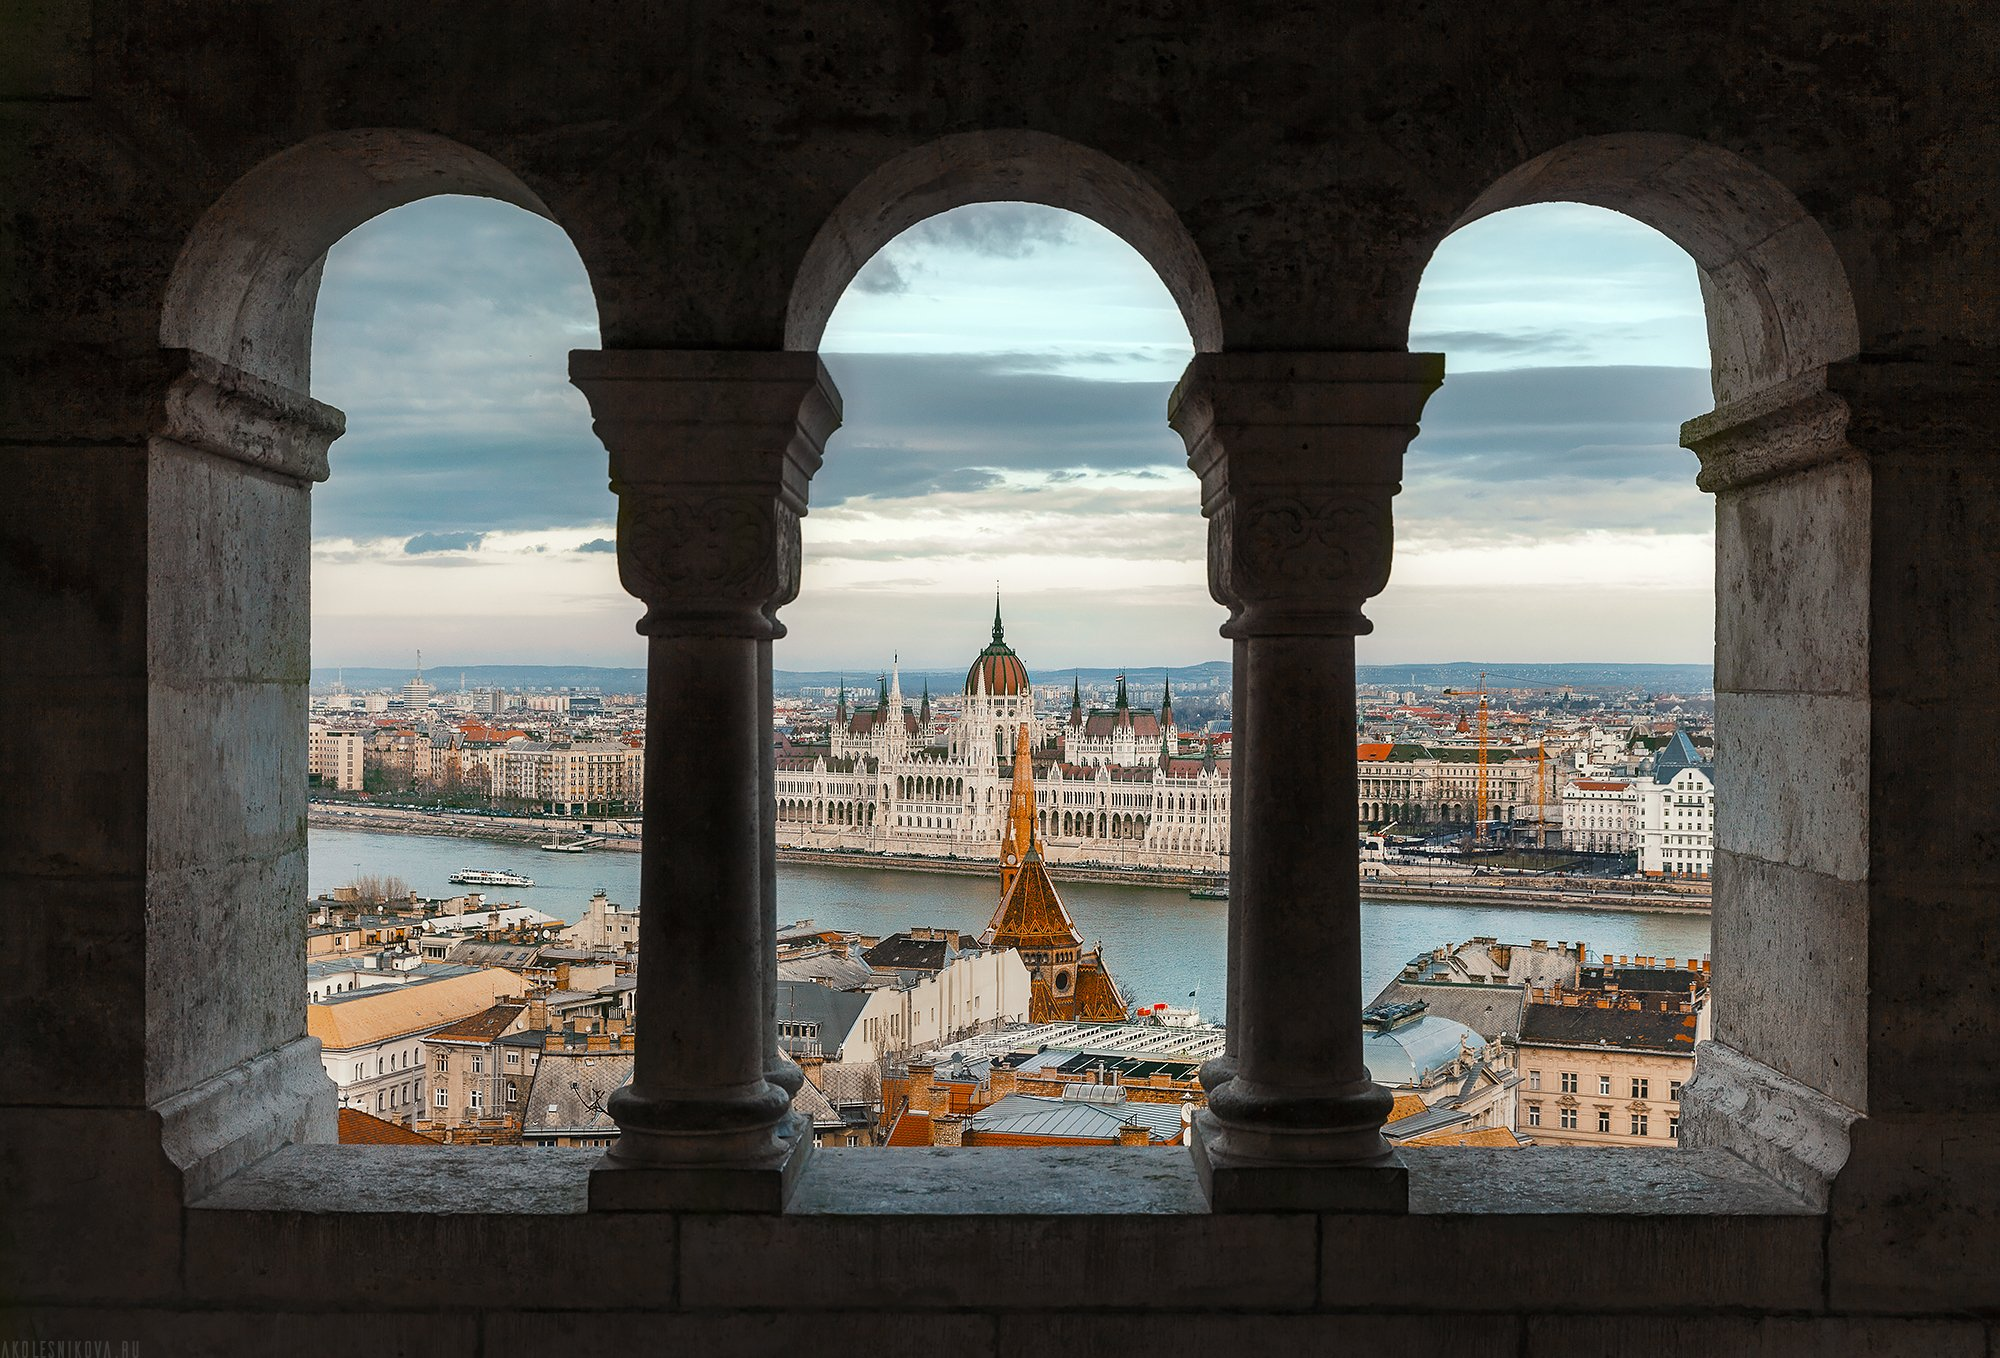 travel, landscape, nature, canon, пейзаж, будаешт, путешествие, Анастасия Колесникова